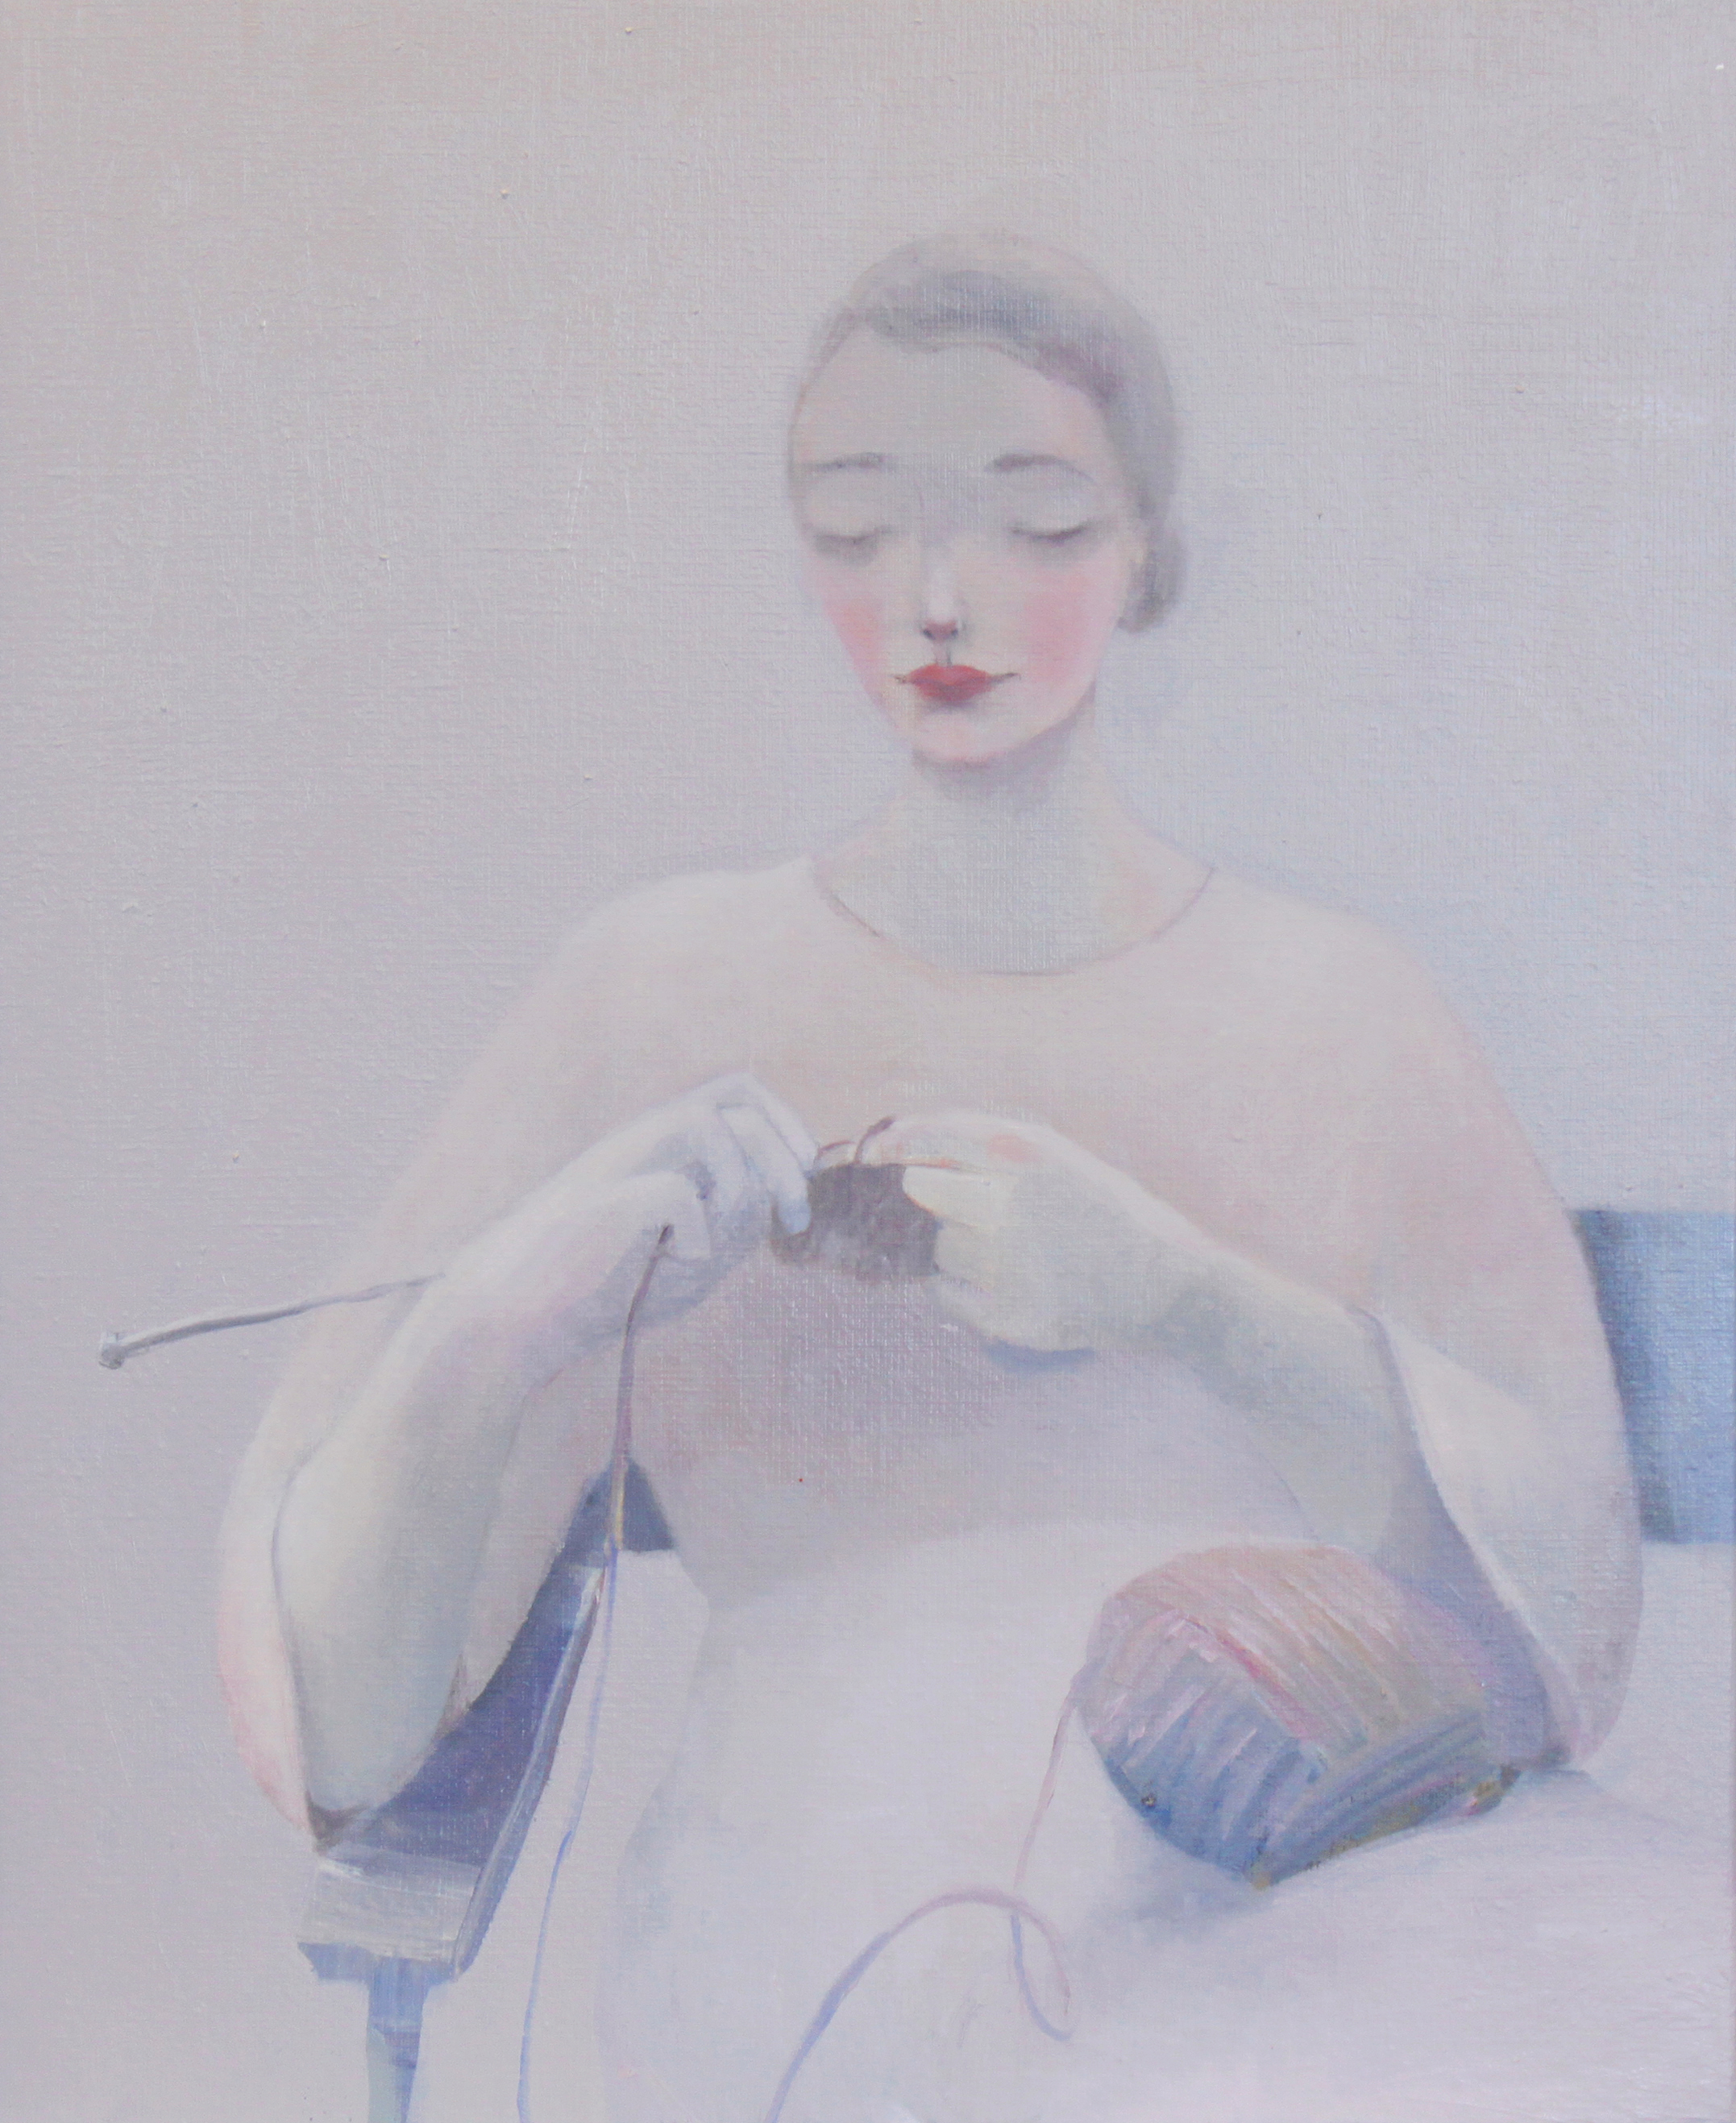 K r i s t i n V e s t g a r d  Days & Nights 40 x 50 cm oil on canvas £ 2300